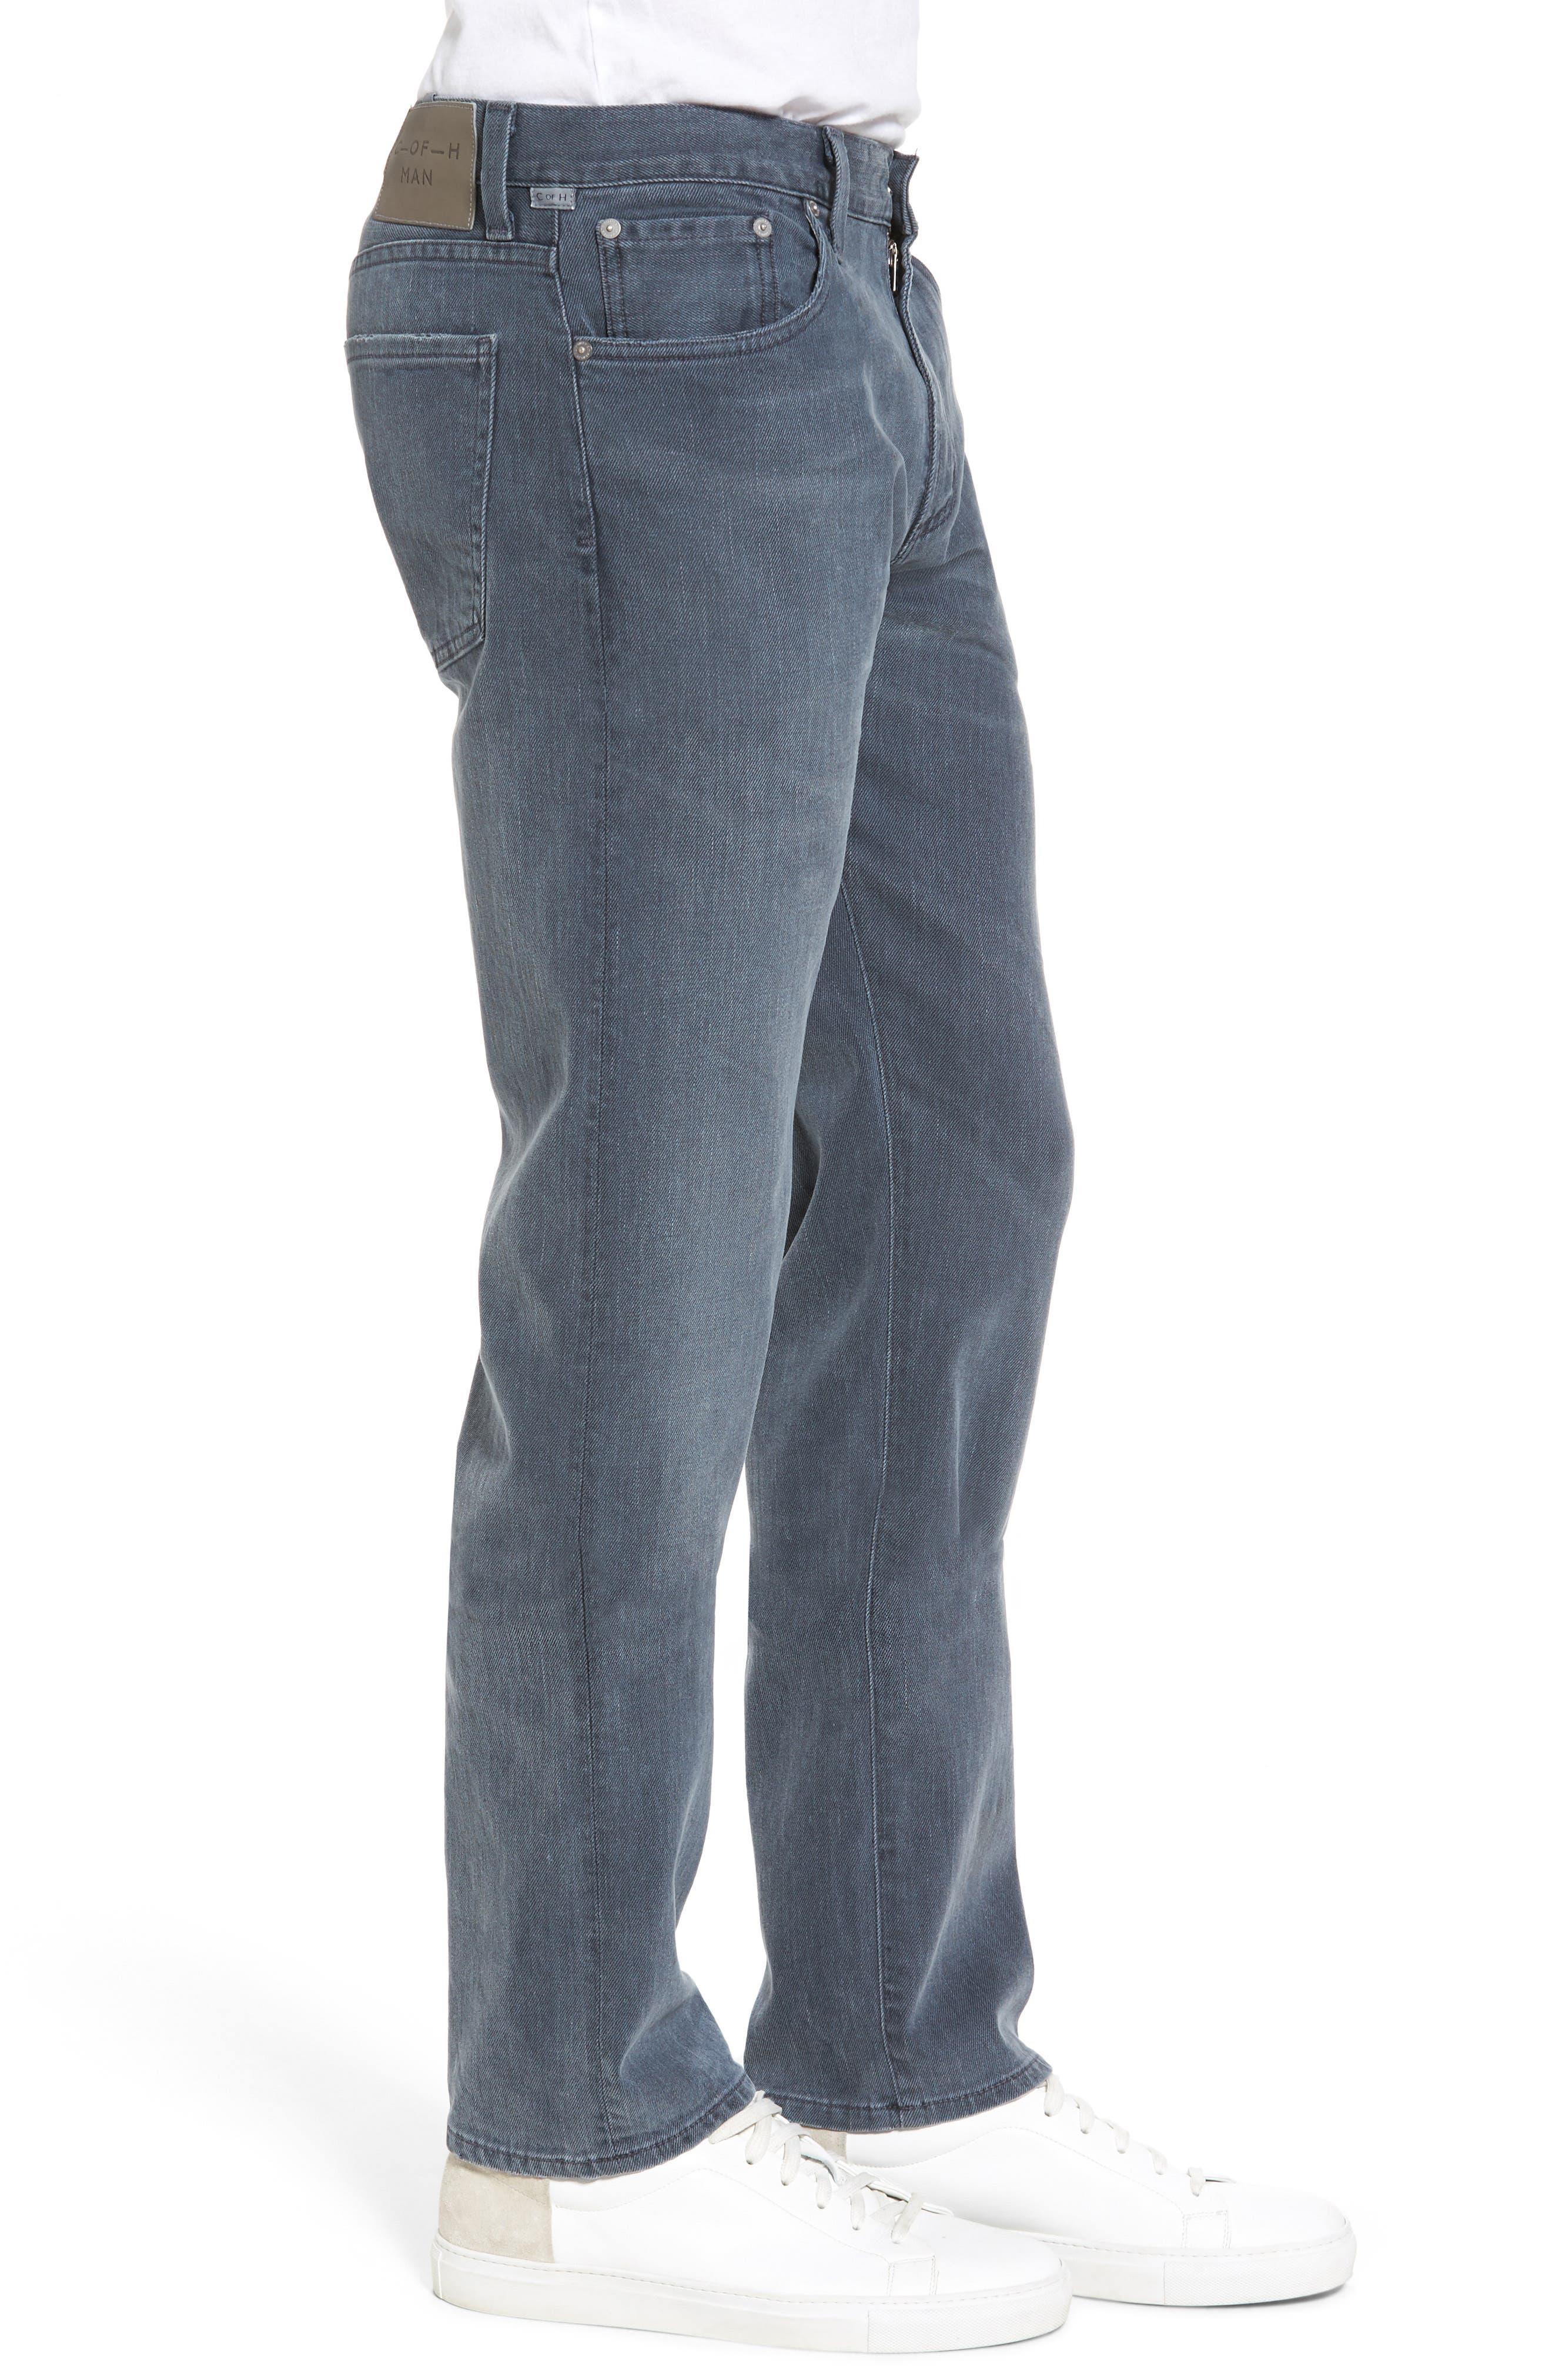 Core Slim Fit Jeans,                             Alternate thumbnail 3, color,                             GREY SKIES